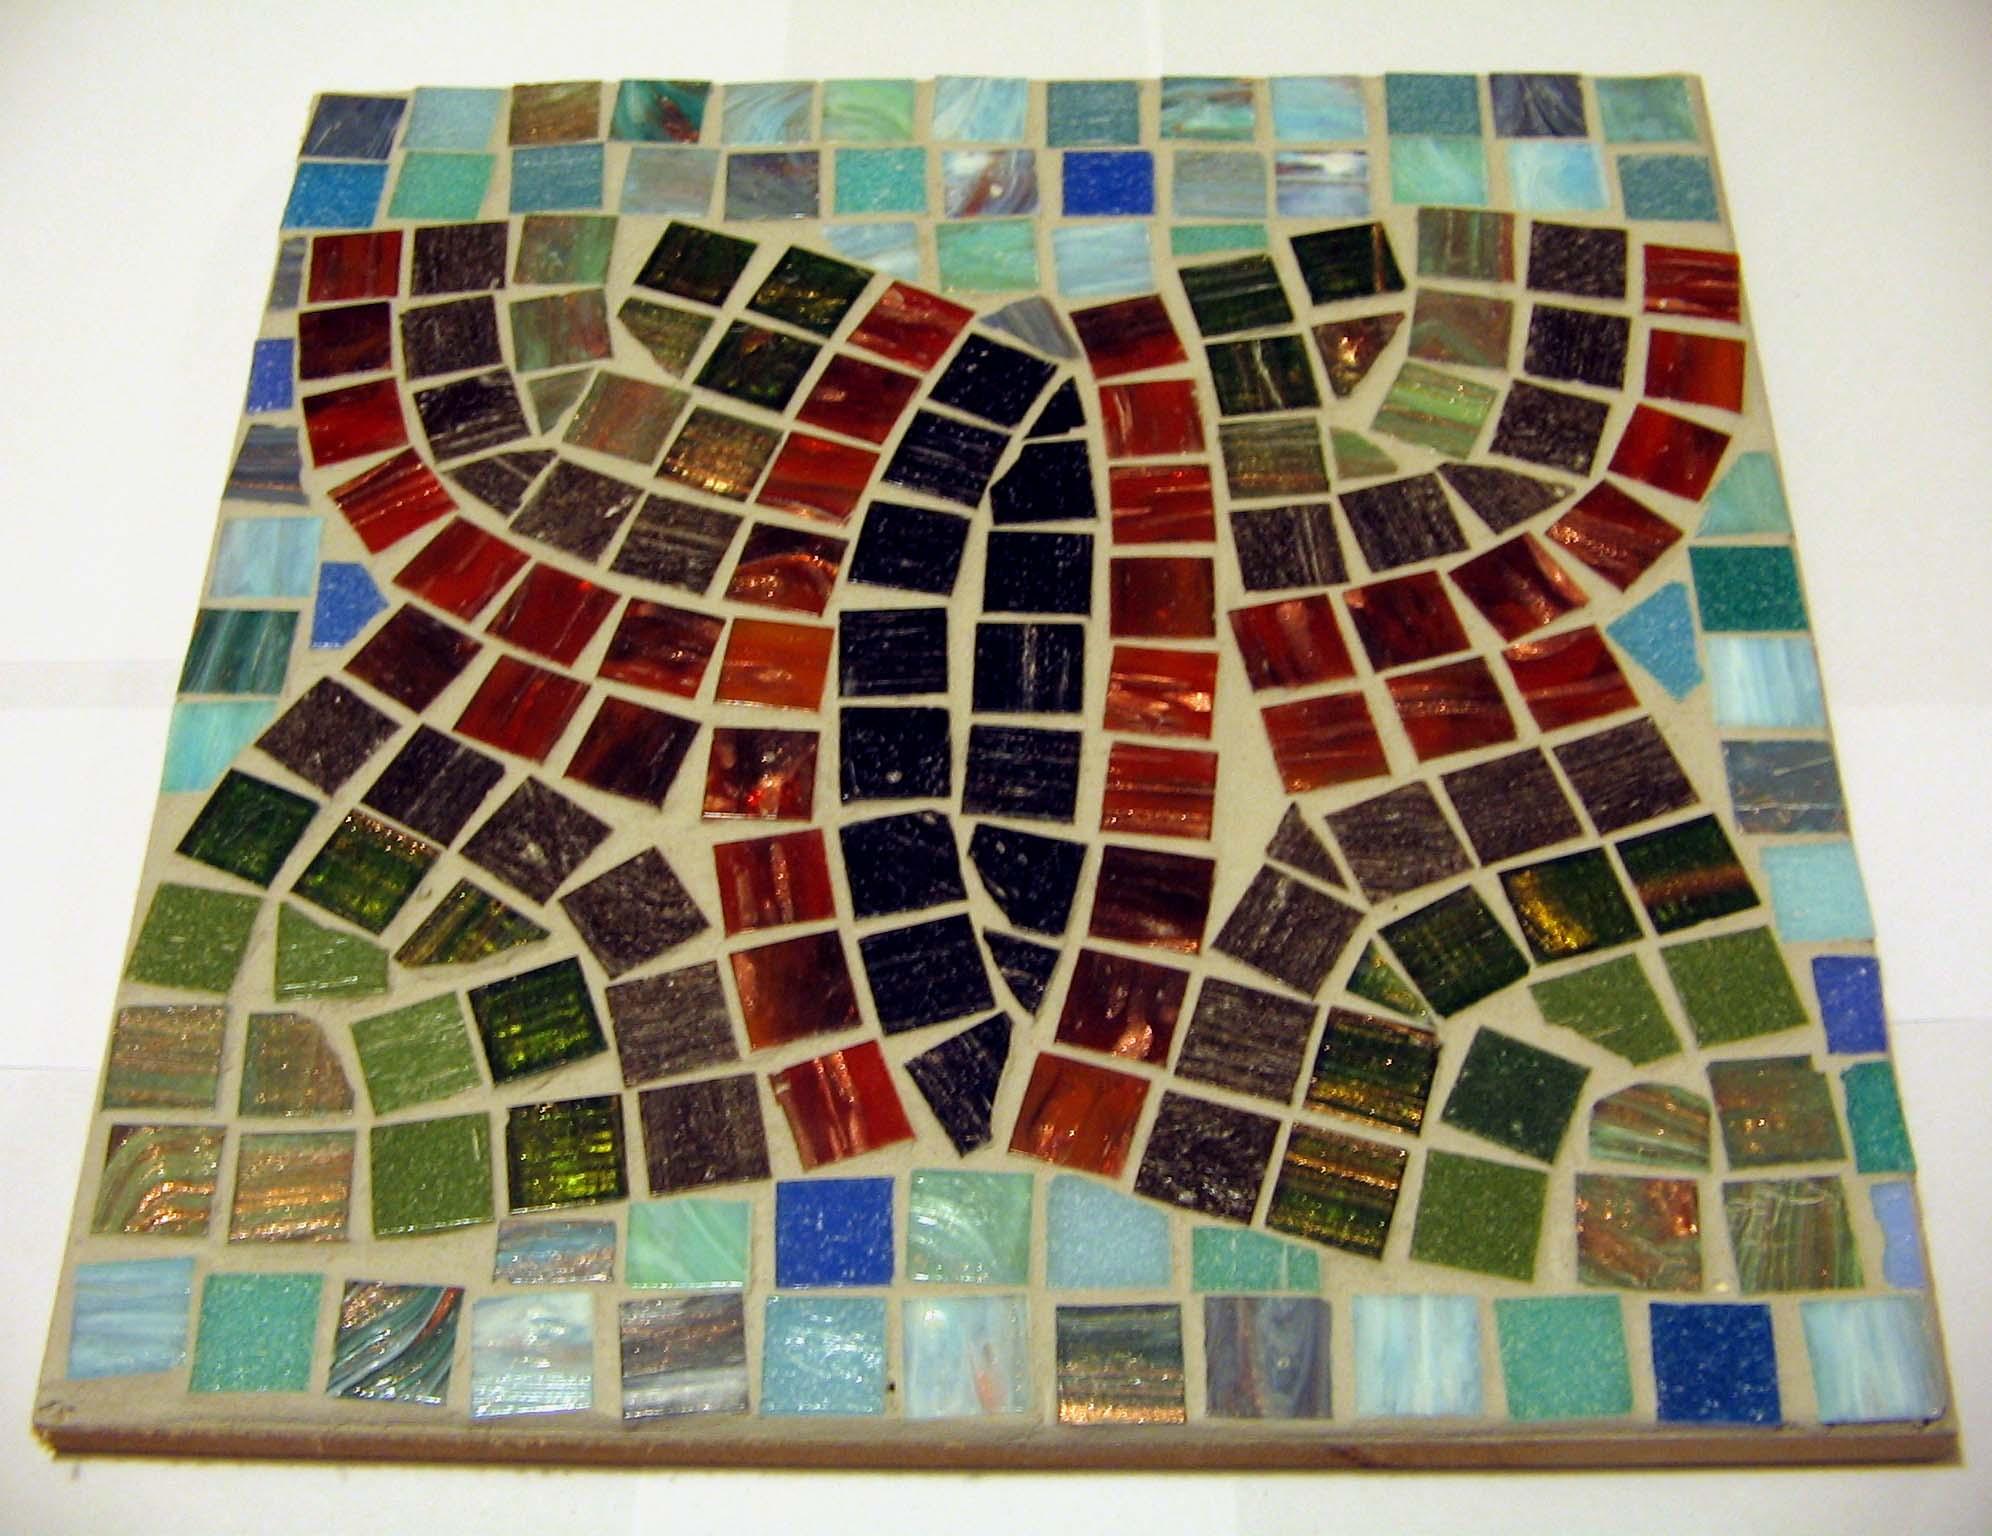 Glass mosaic on board